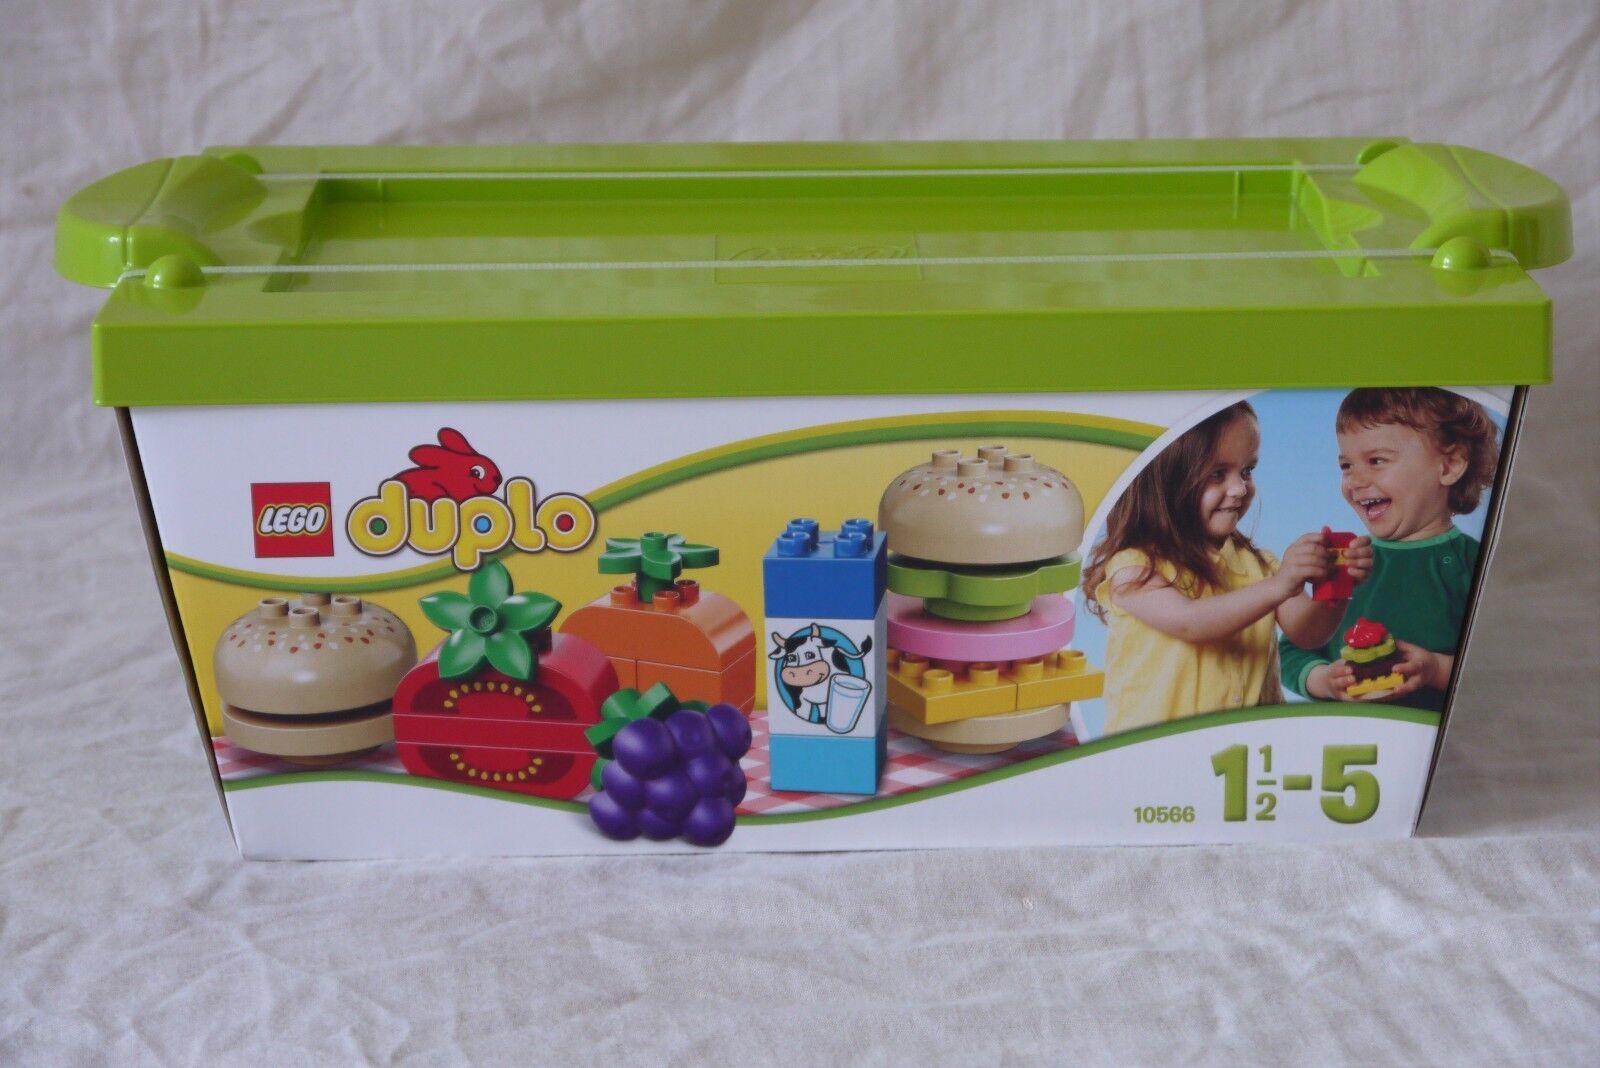 3 x Lego 10566 Duplo CREATIVE PICNIC - New